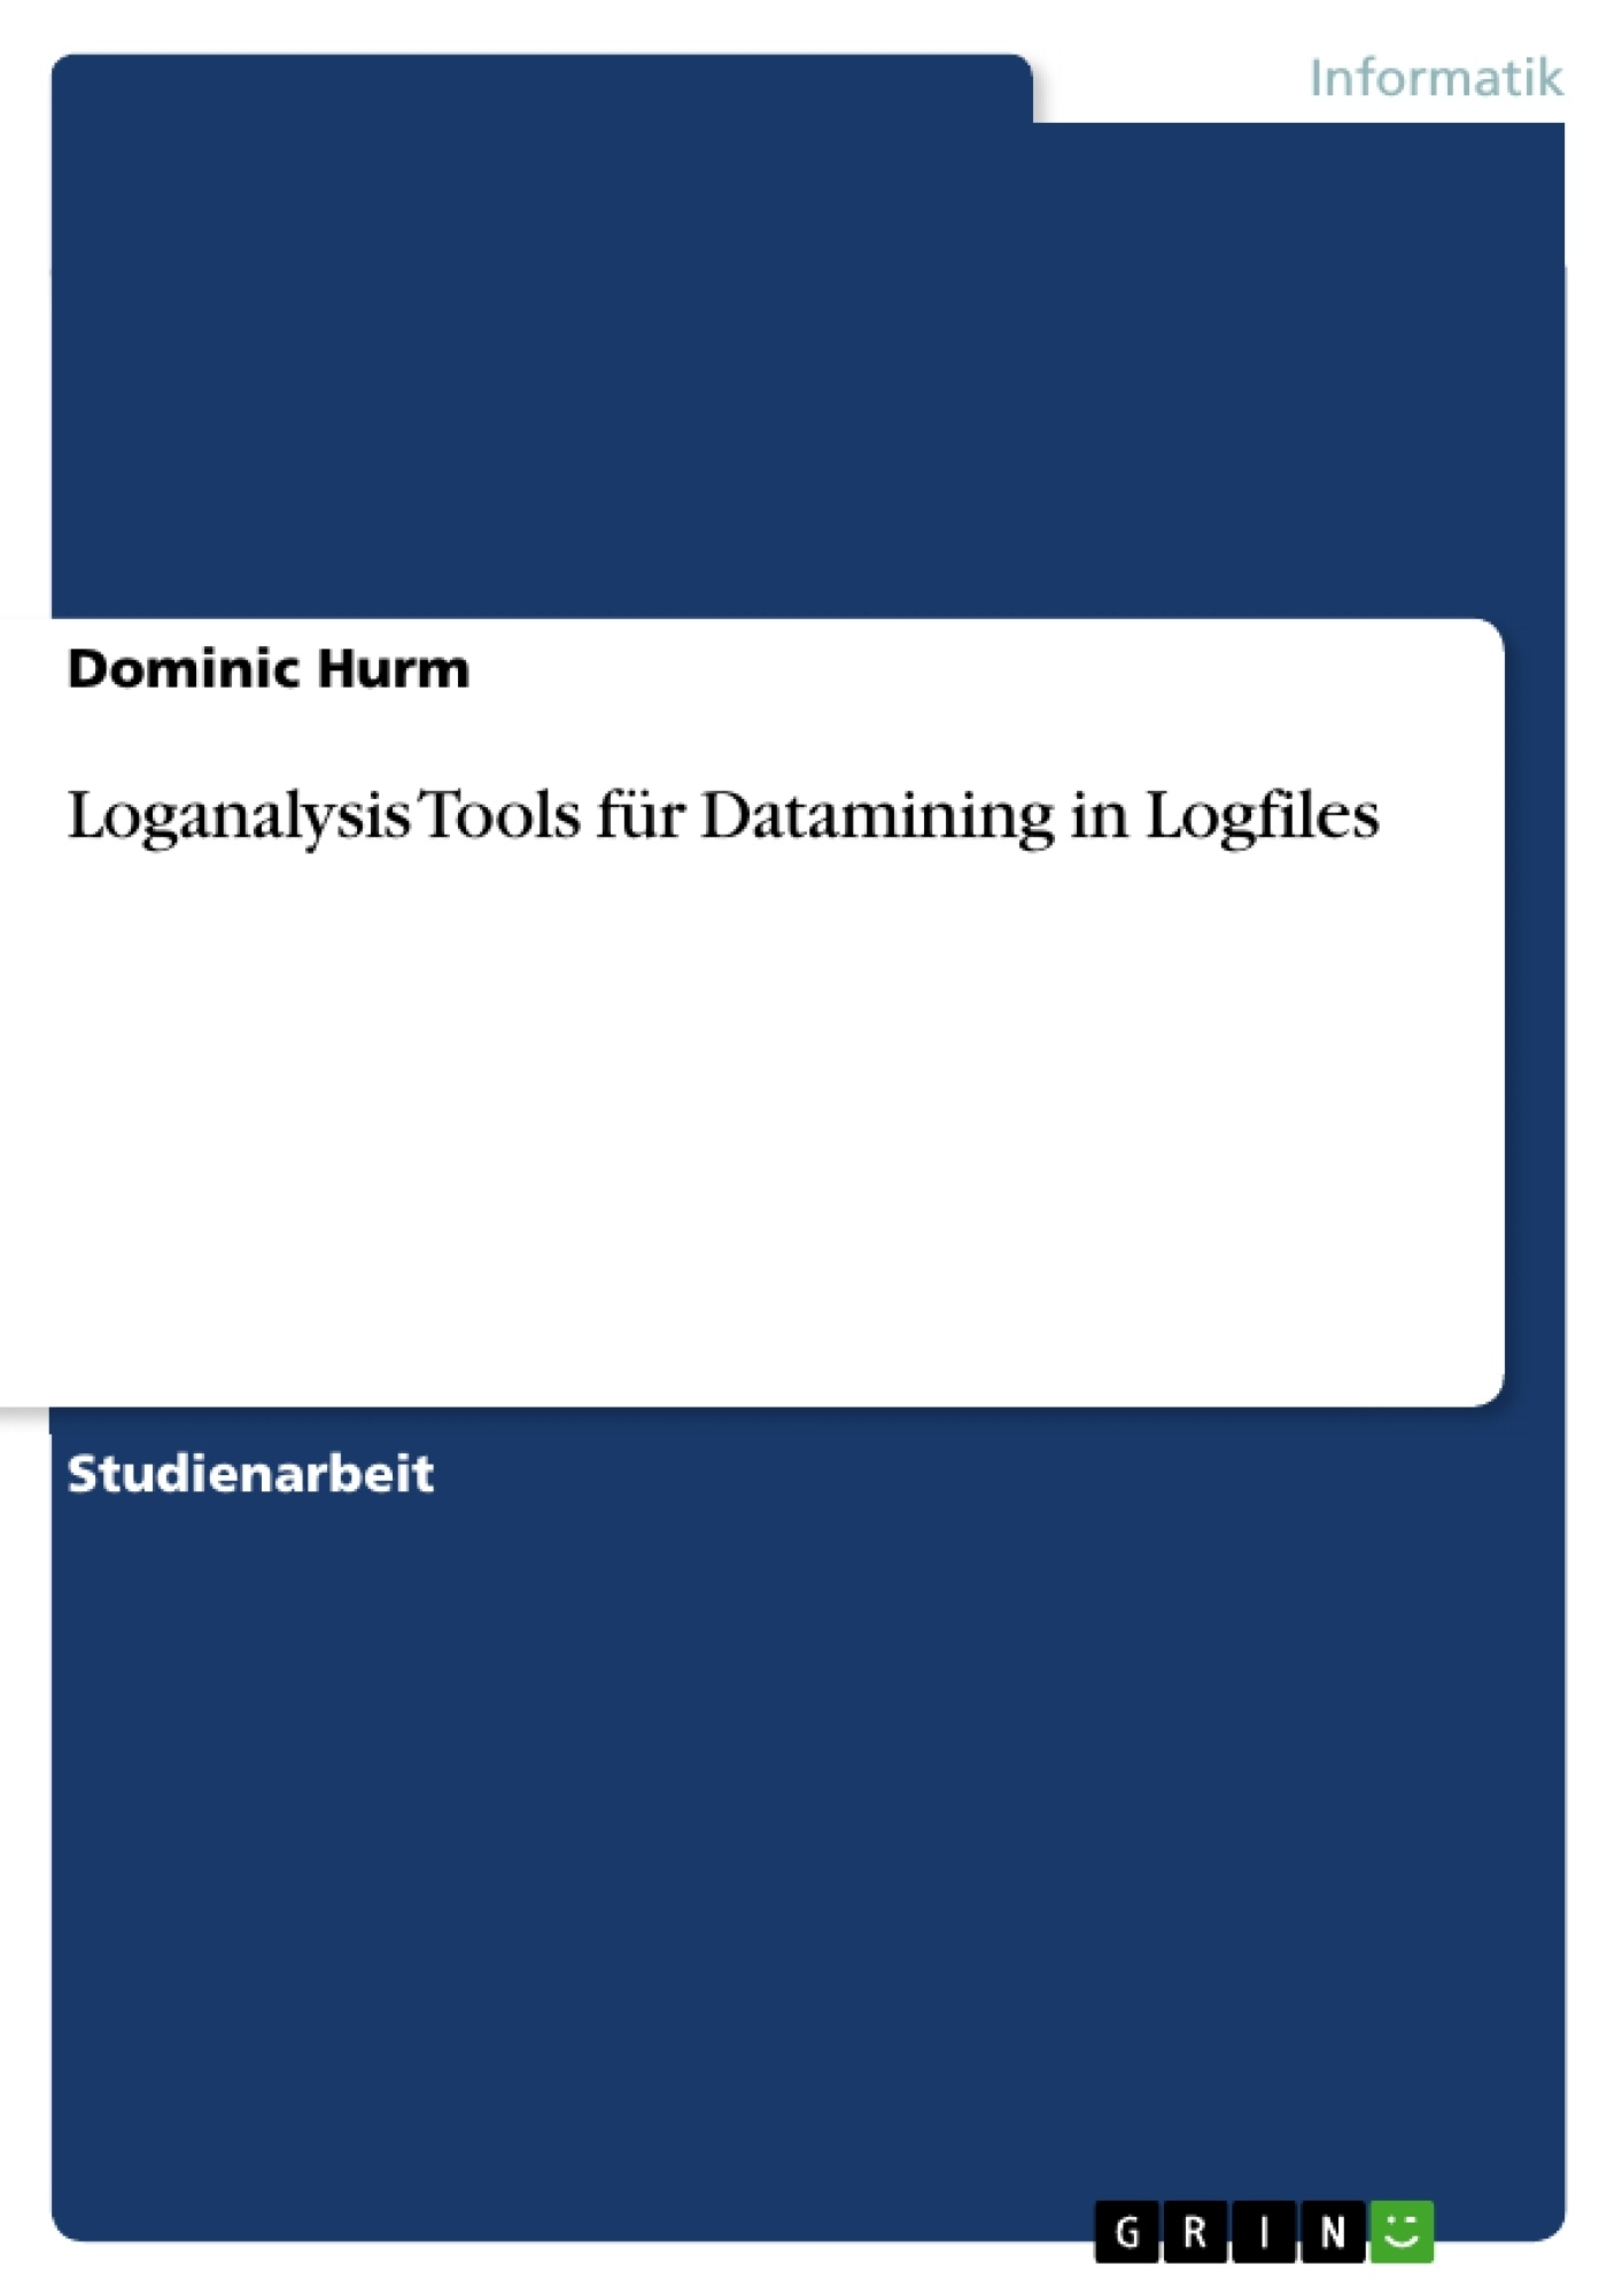 Titel: Loganalysis Tools für Datamining in Logfiles